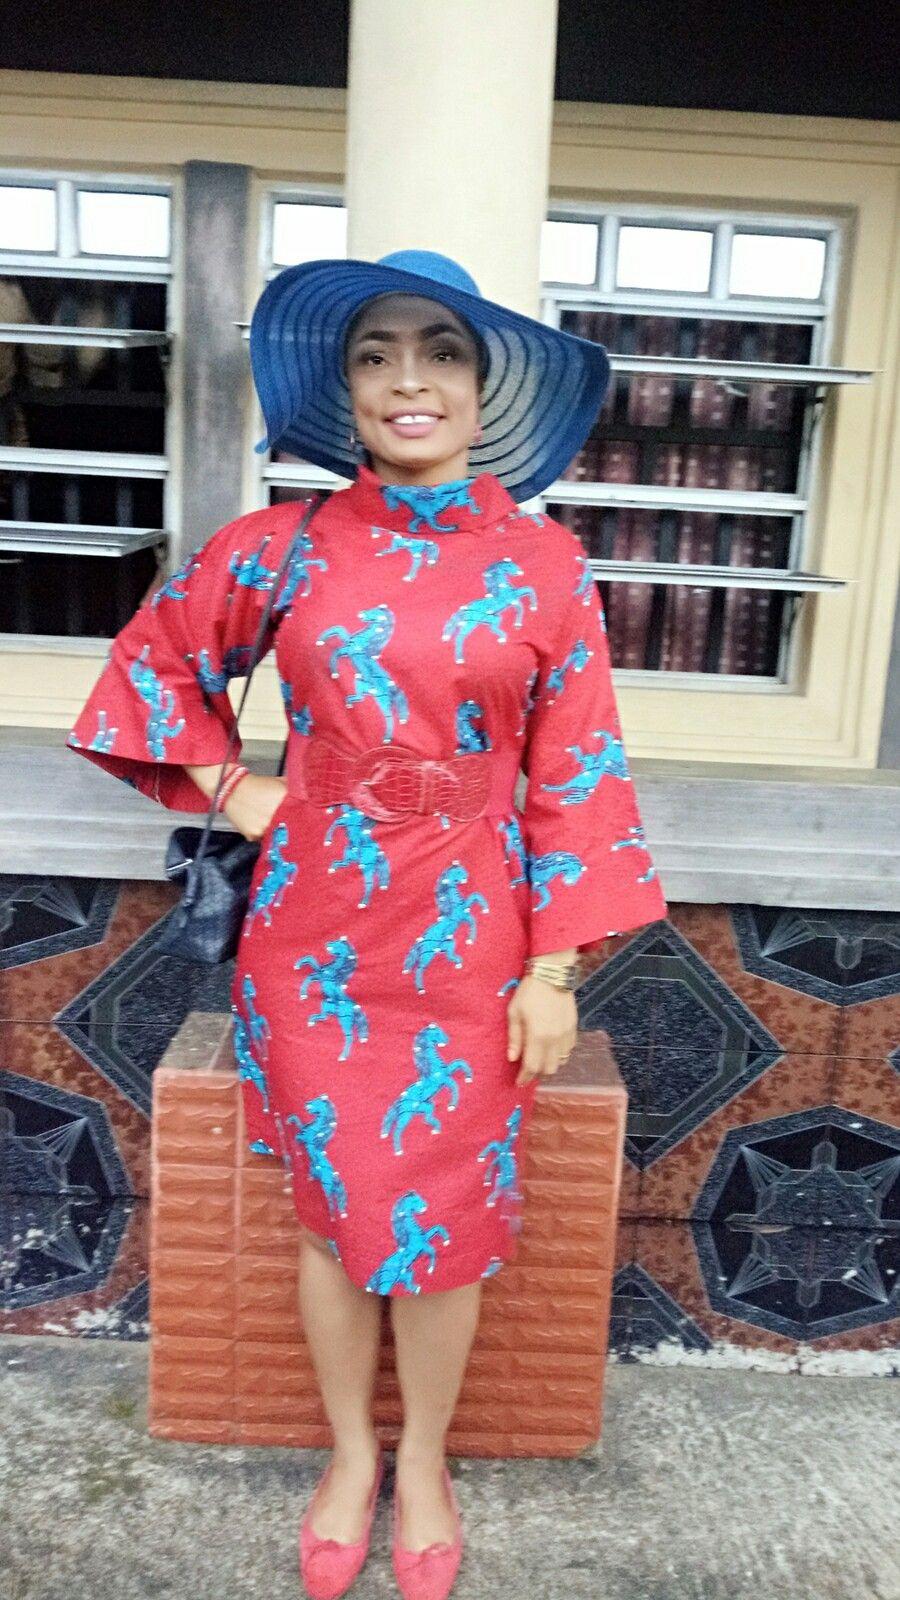 Lookbook - Fashion inspiration by | African fashion